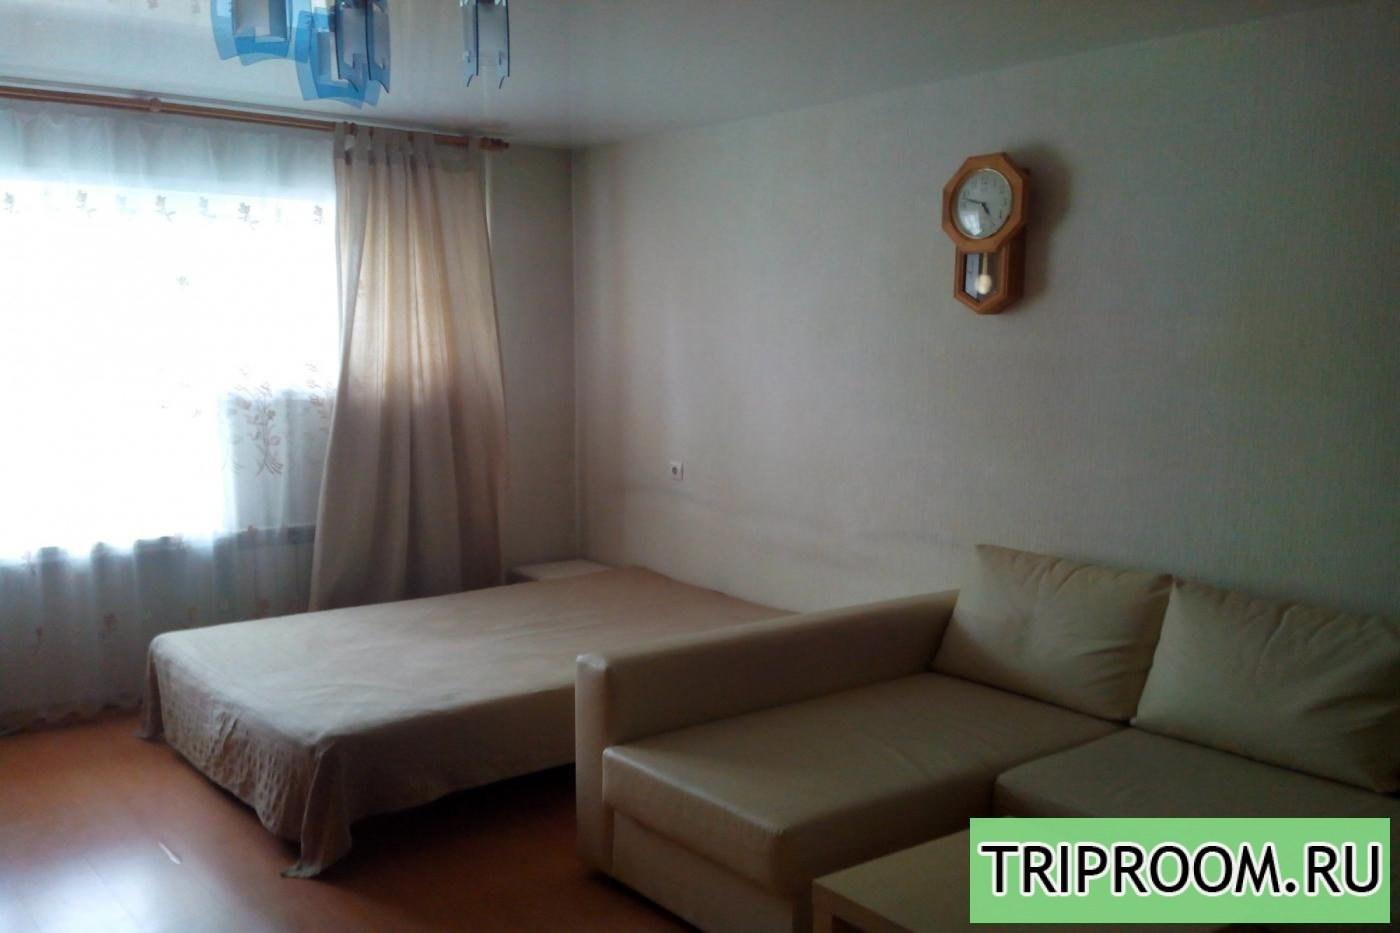 1-комнатная квартира посуточно (вариант № 10468), ул. Ломоносова улица, фото № 1